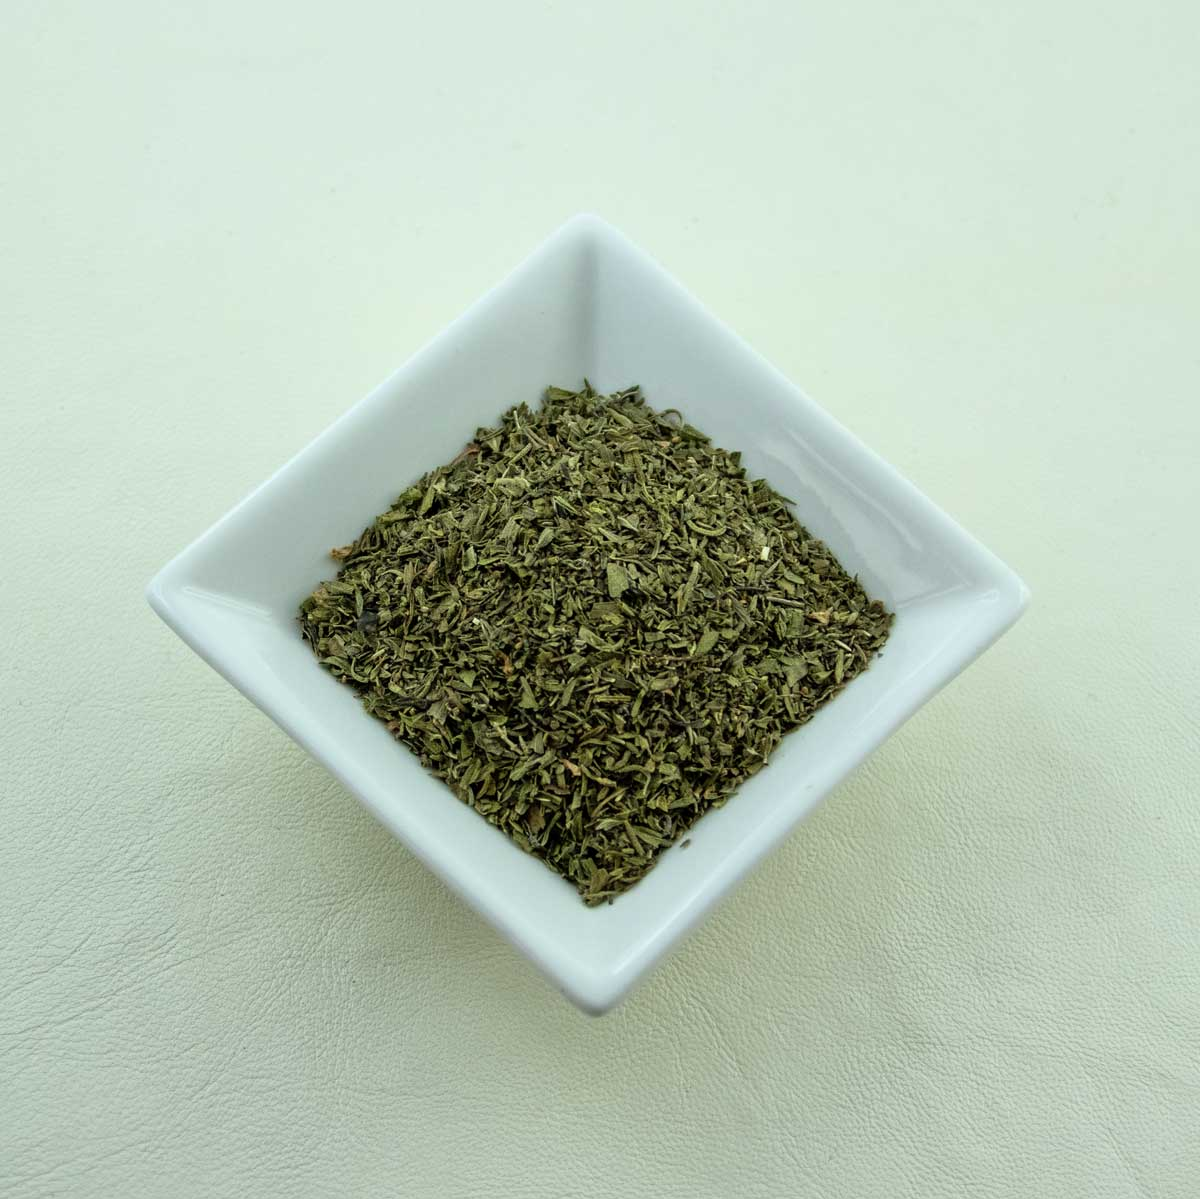 Bohnenkraut gerebelt 50g